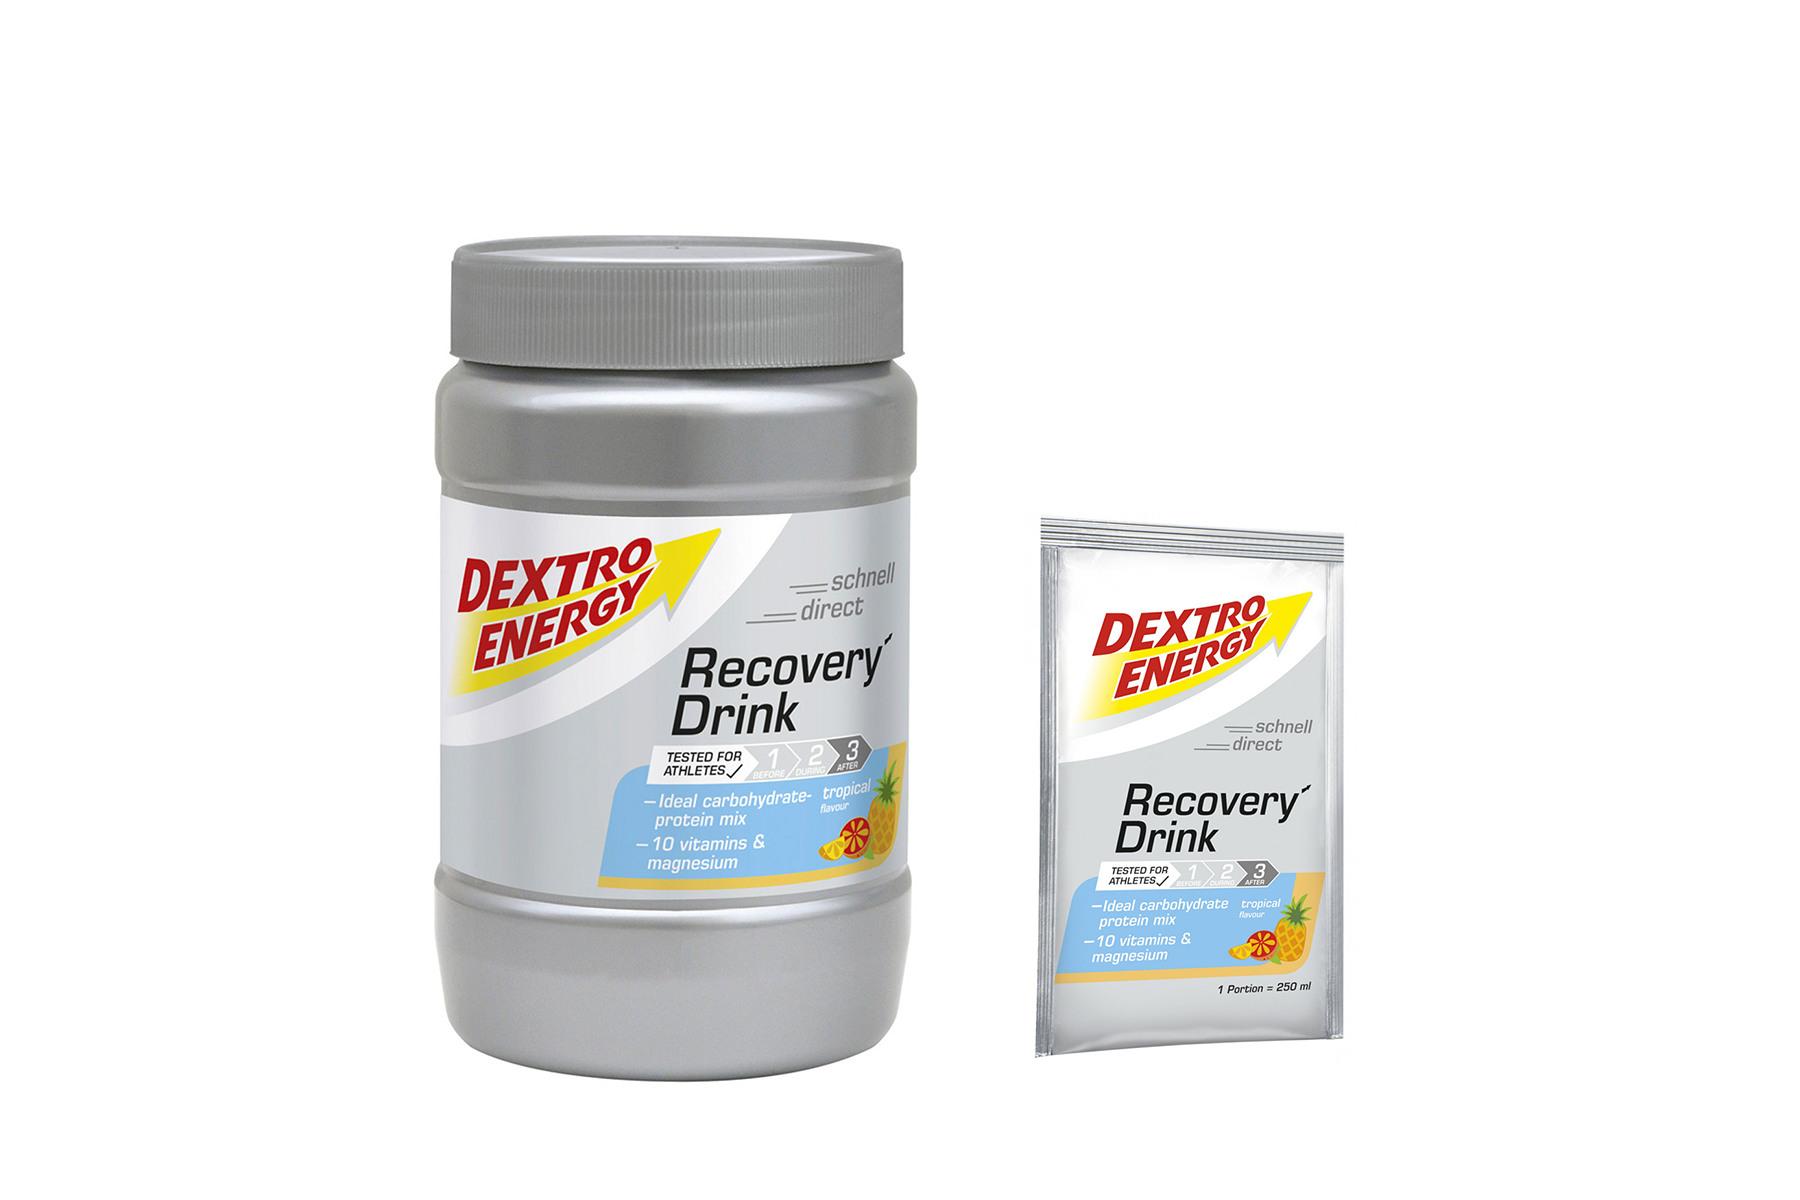 buy dextro energy drink powder recovery drink rose bikes